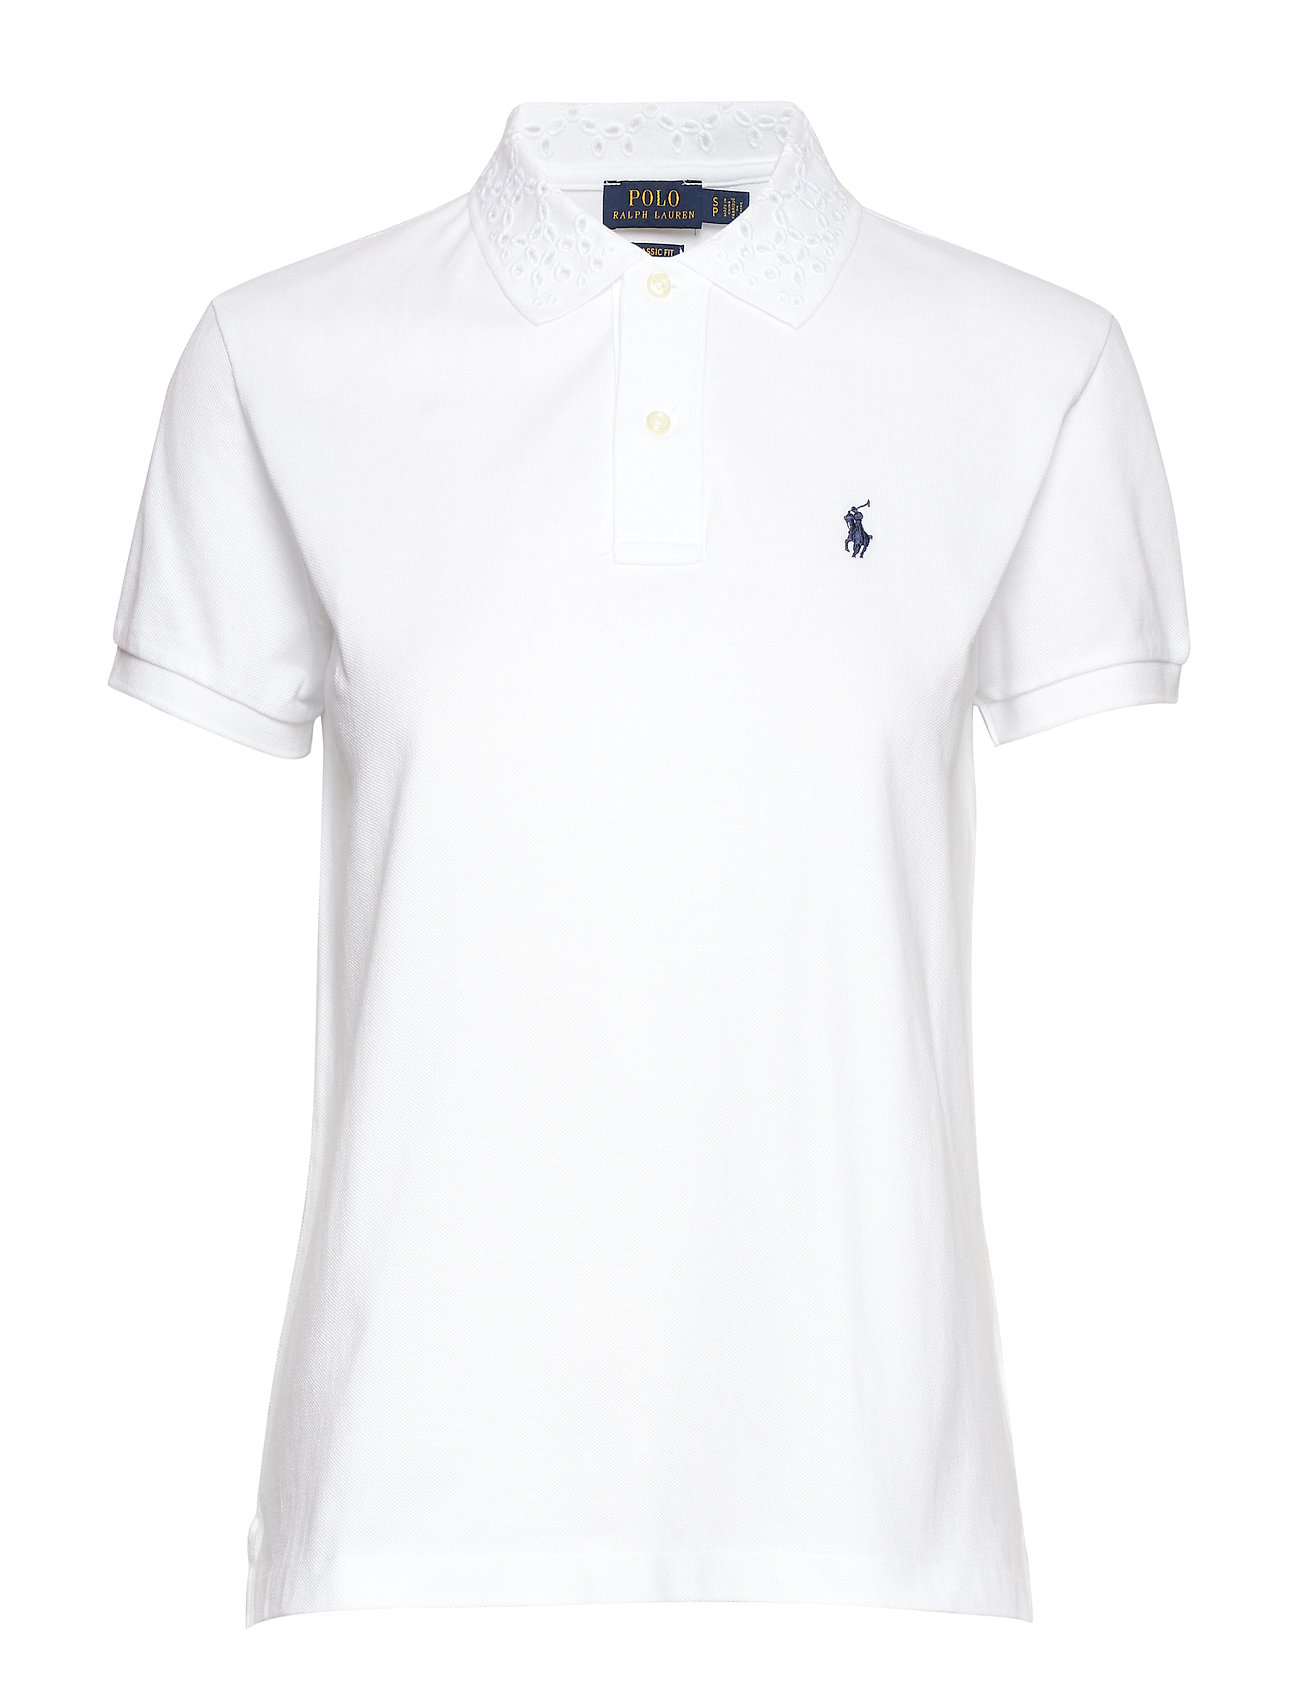 Polo Ralph Lauren Classic Fit Eyelet Polo Shirt